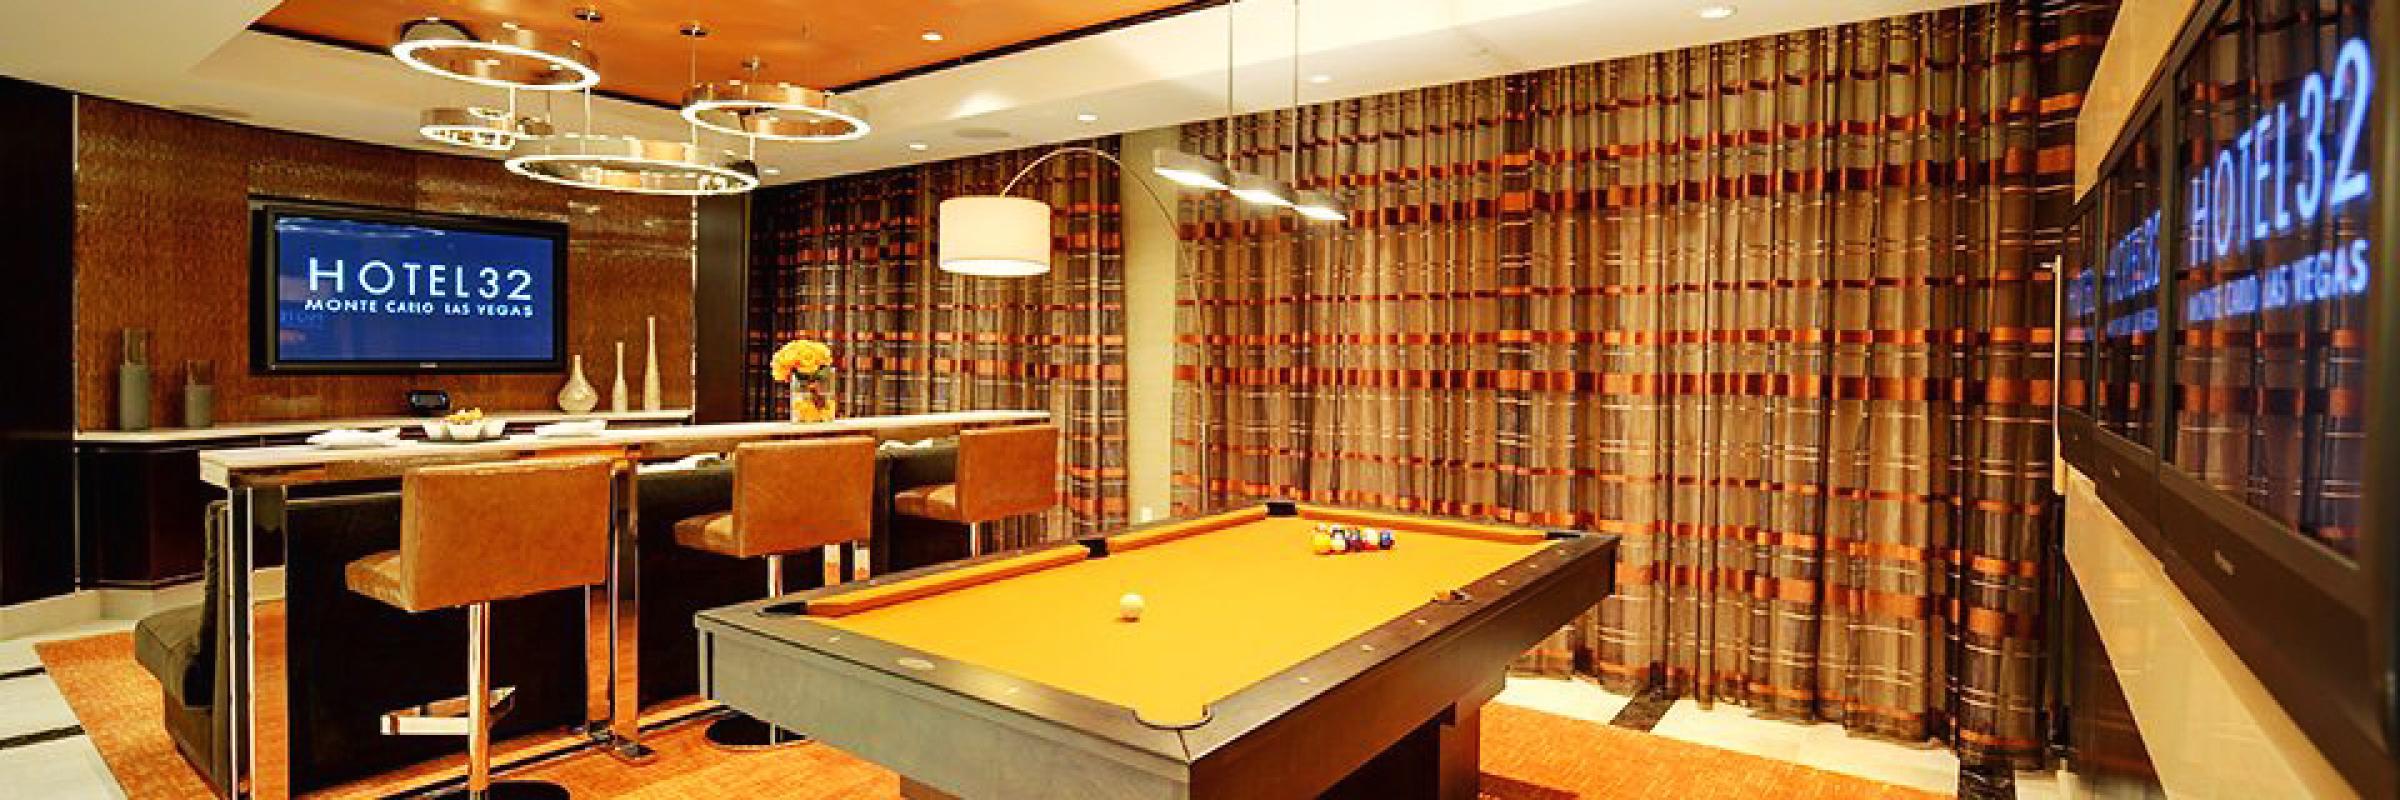 Las Vegas -- Monte Carlo Resort & Casino 1